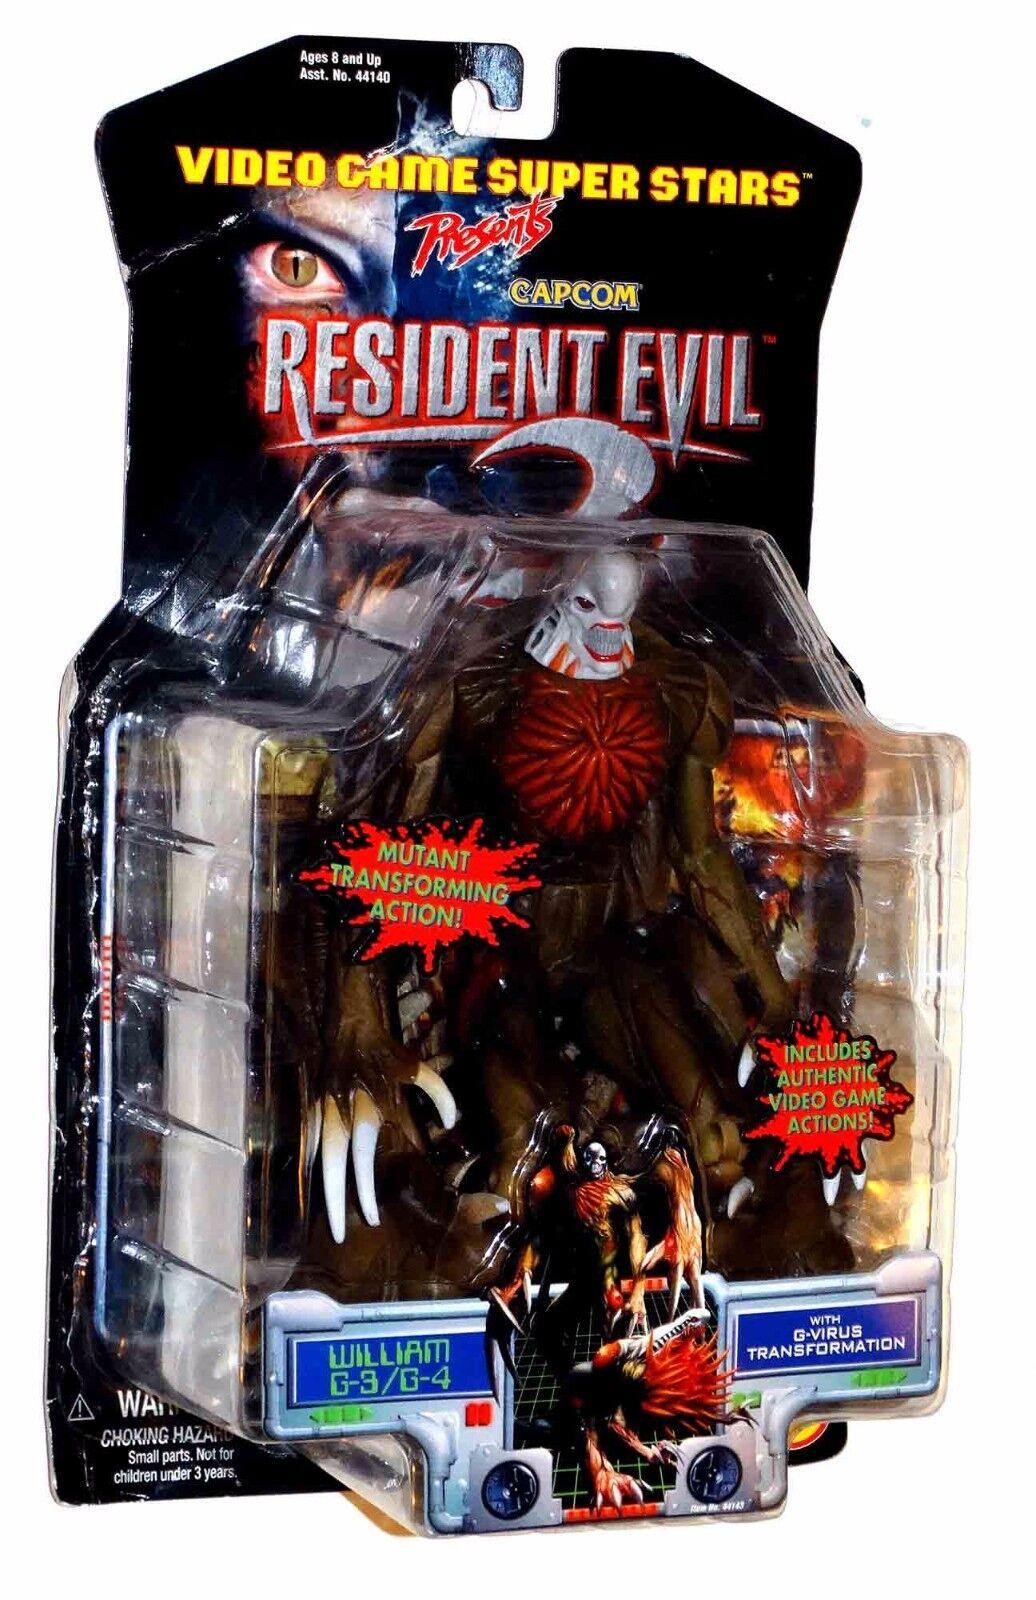 Resident evil 2 william g - 3   g - 4 - actionfigur moc   versiegelt 1998 spielzeug biz   capcom